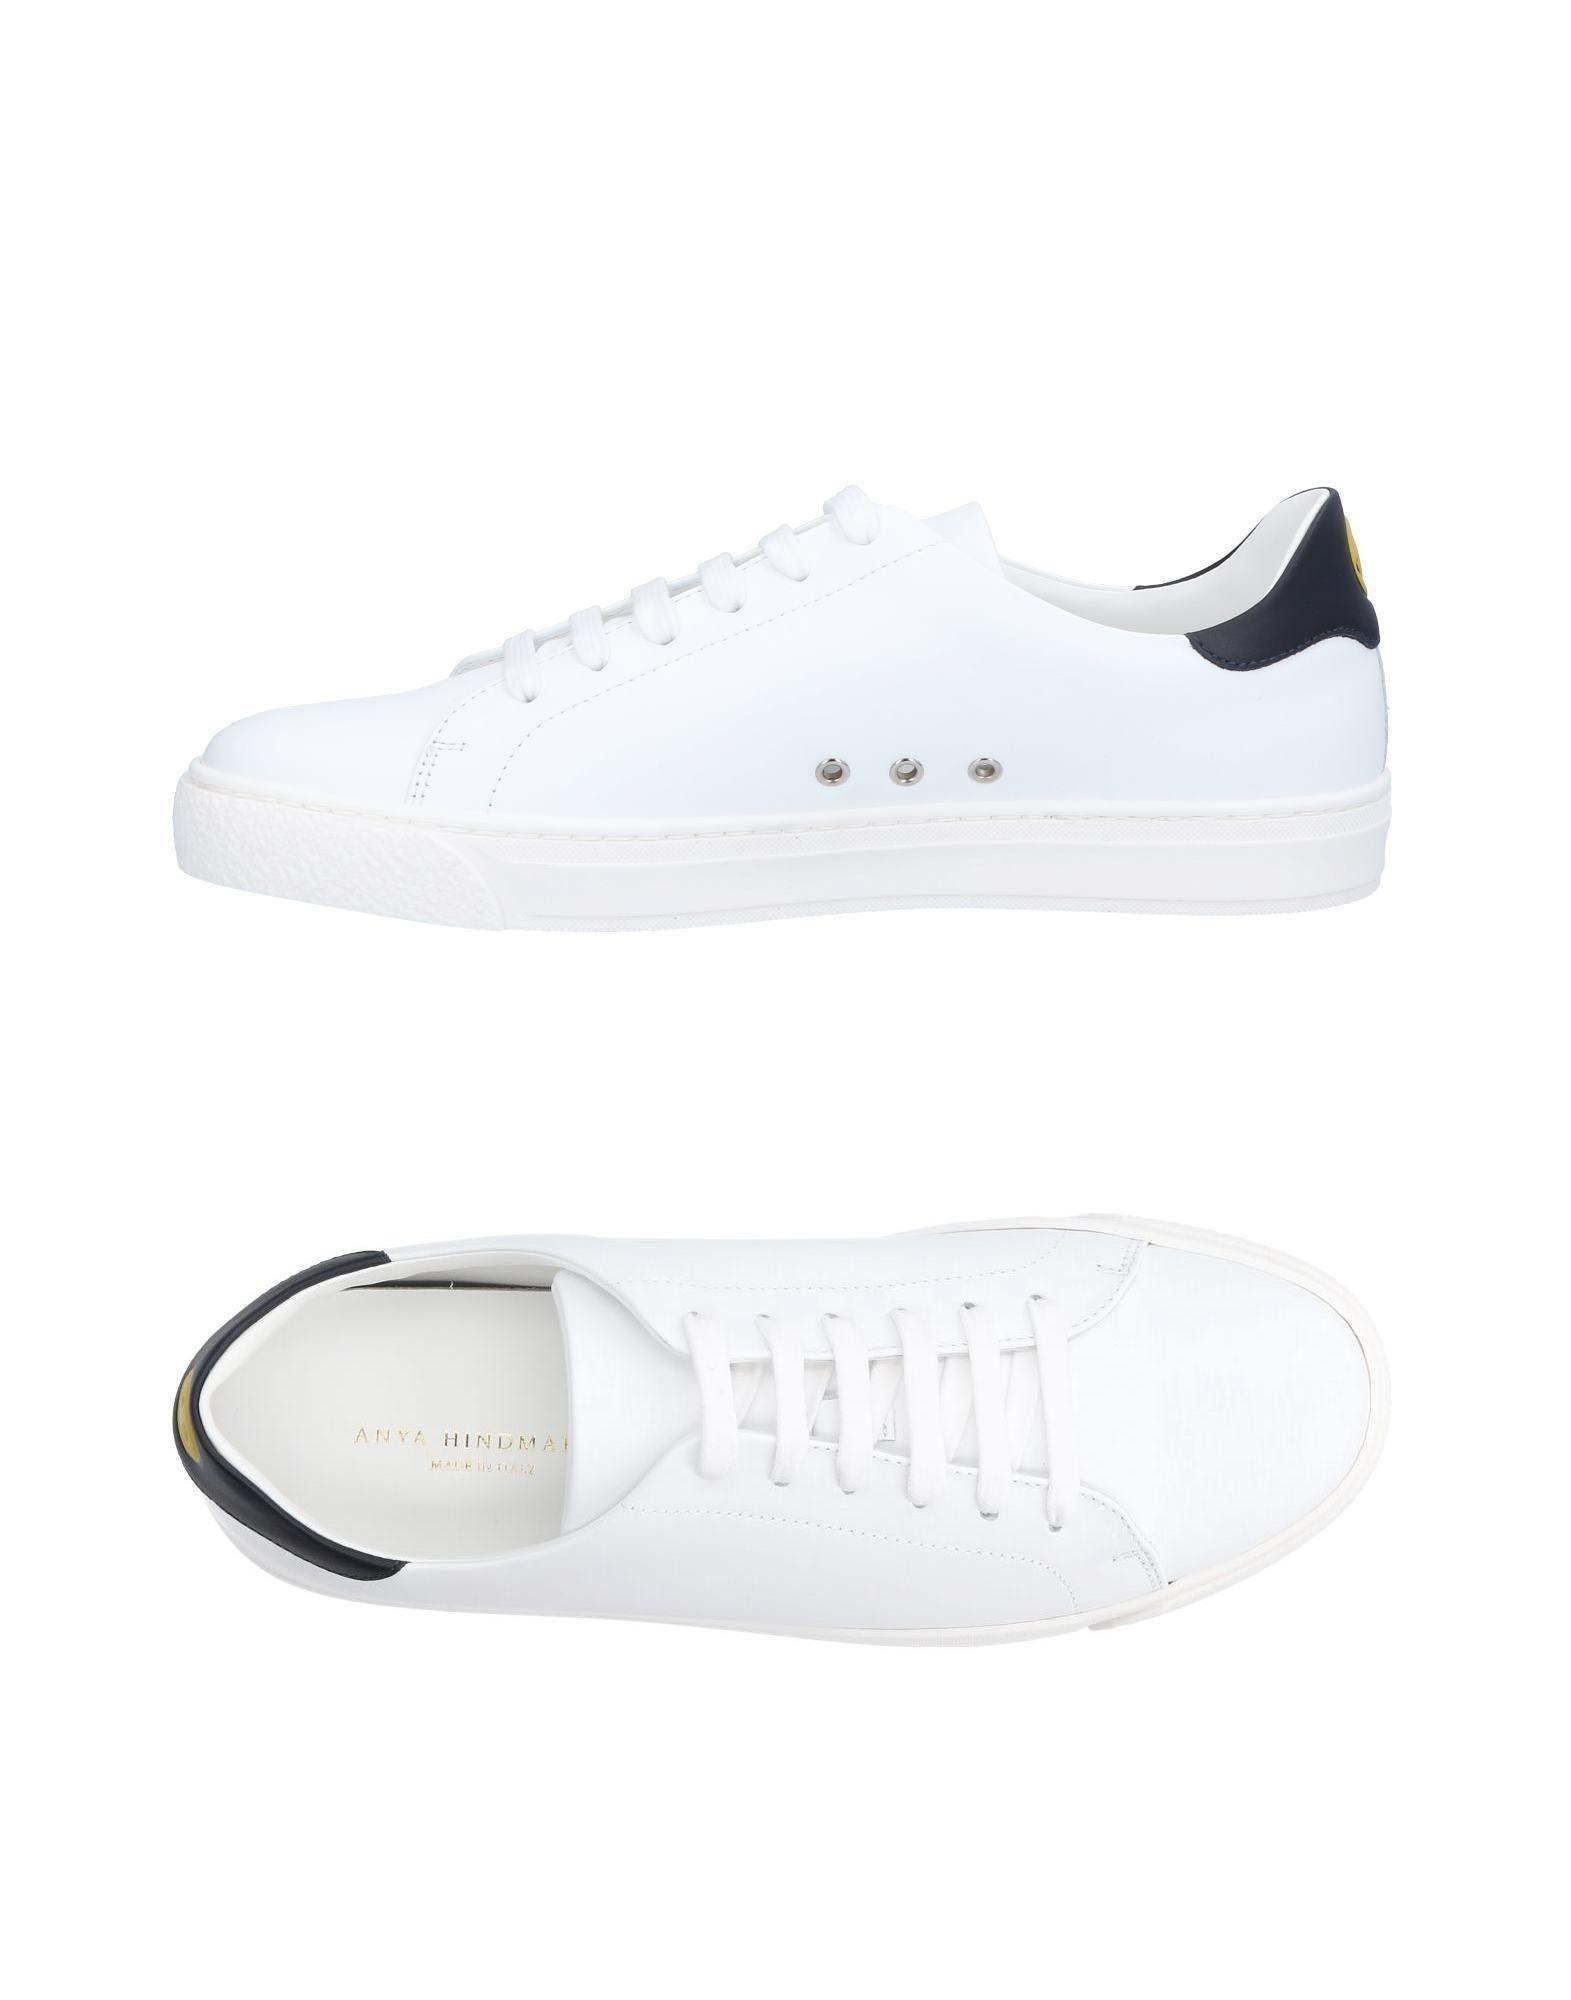 Anya Hindmarch Sneakers Damen  11463544DHGut aussehende aussehende aussehende strapazierfähige Schuhe 489594